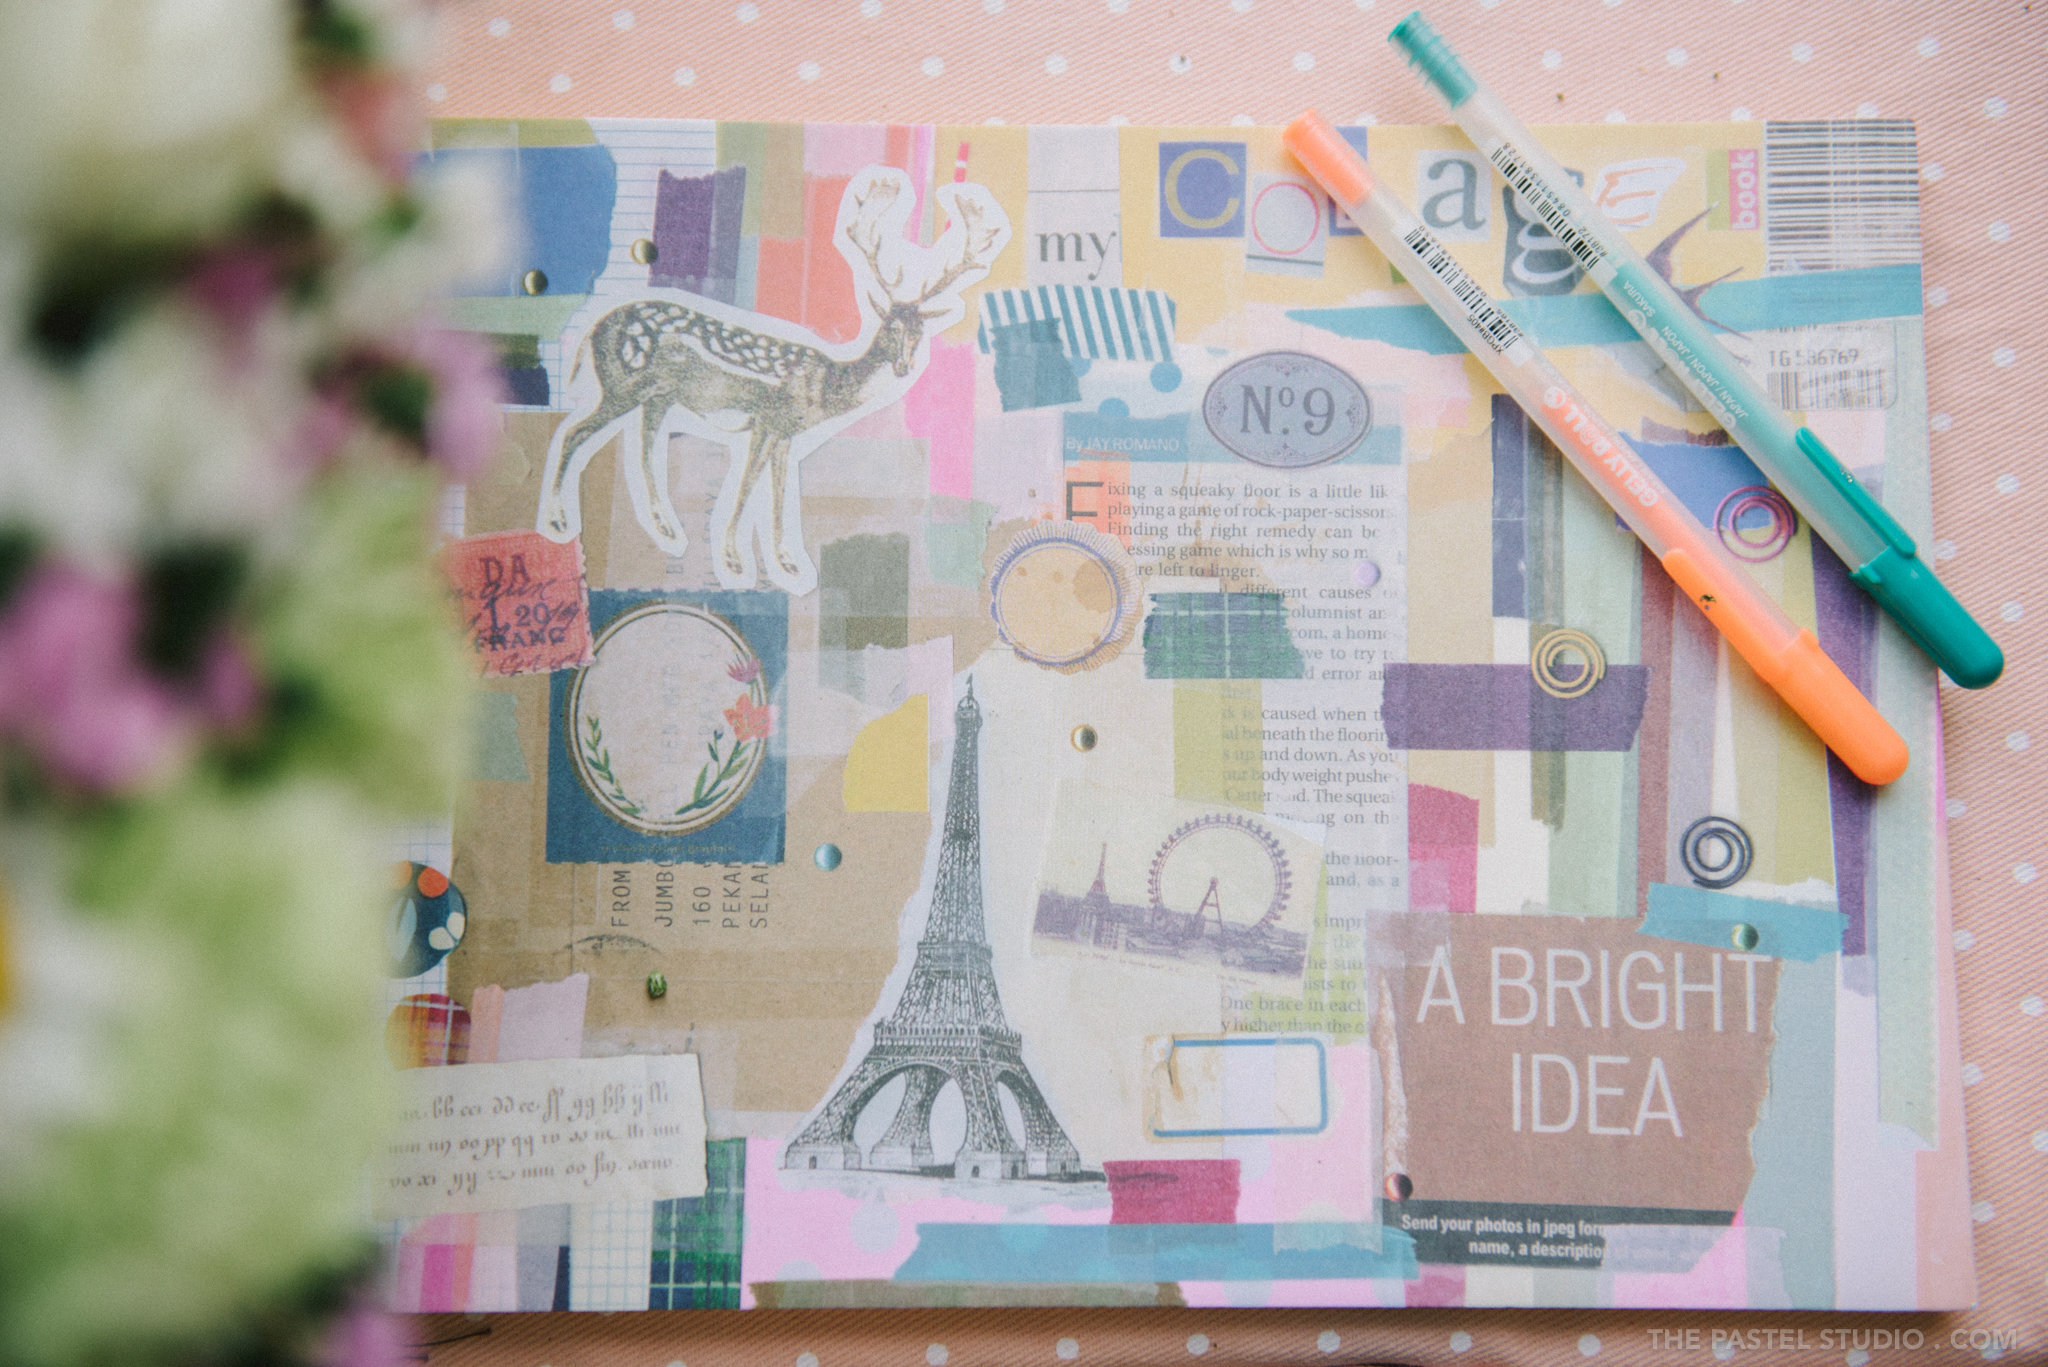 The Pastel Studio (15 of 111).jpg